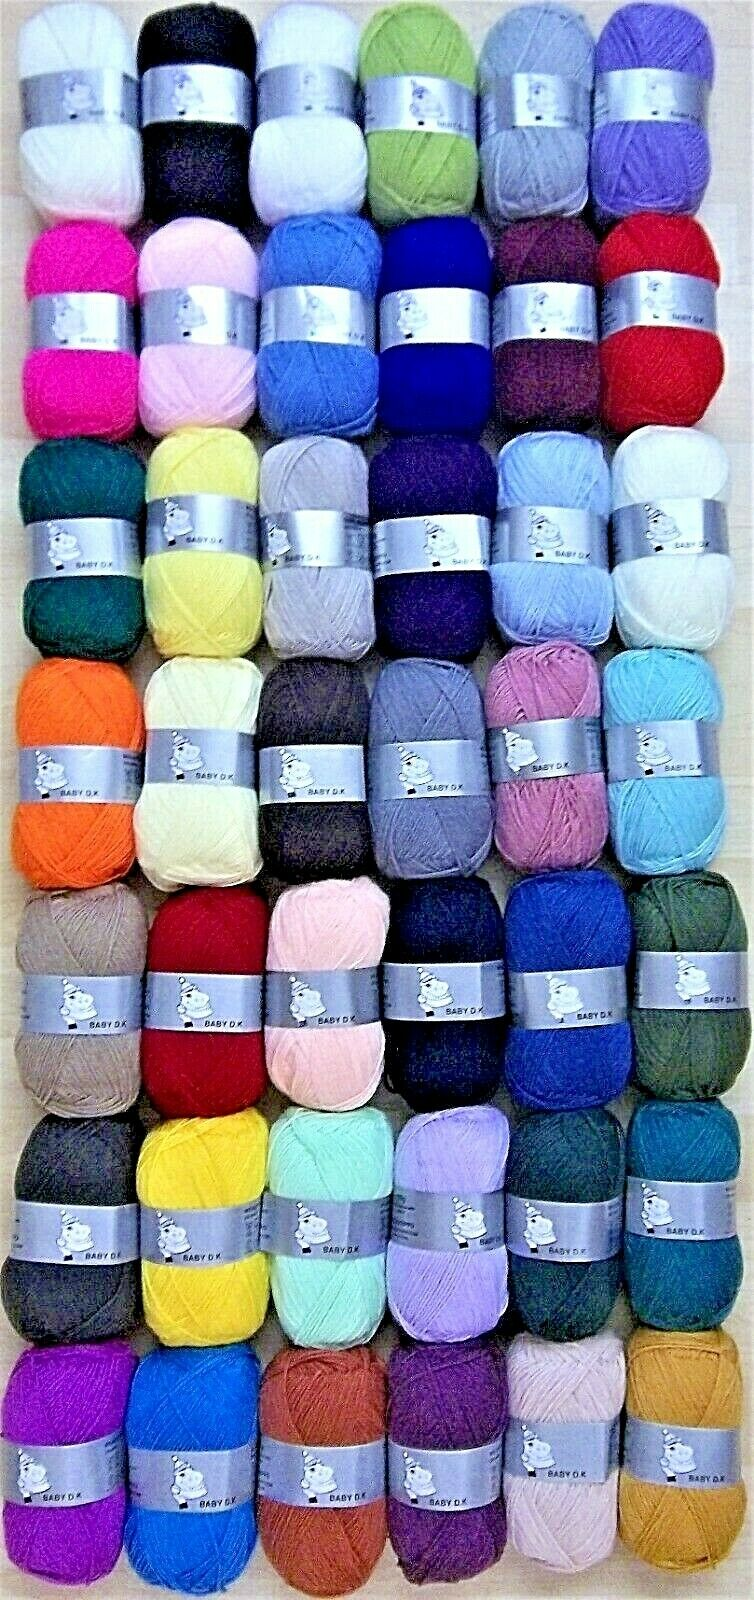 Choose Colour 1000g Wool 2000 Metres Double Knit Knitting Yarn 1 Kilo Balls DK